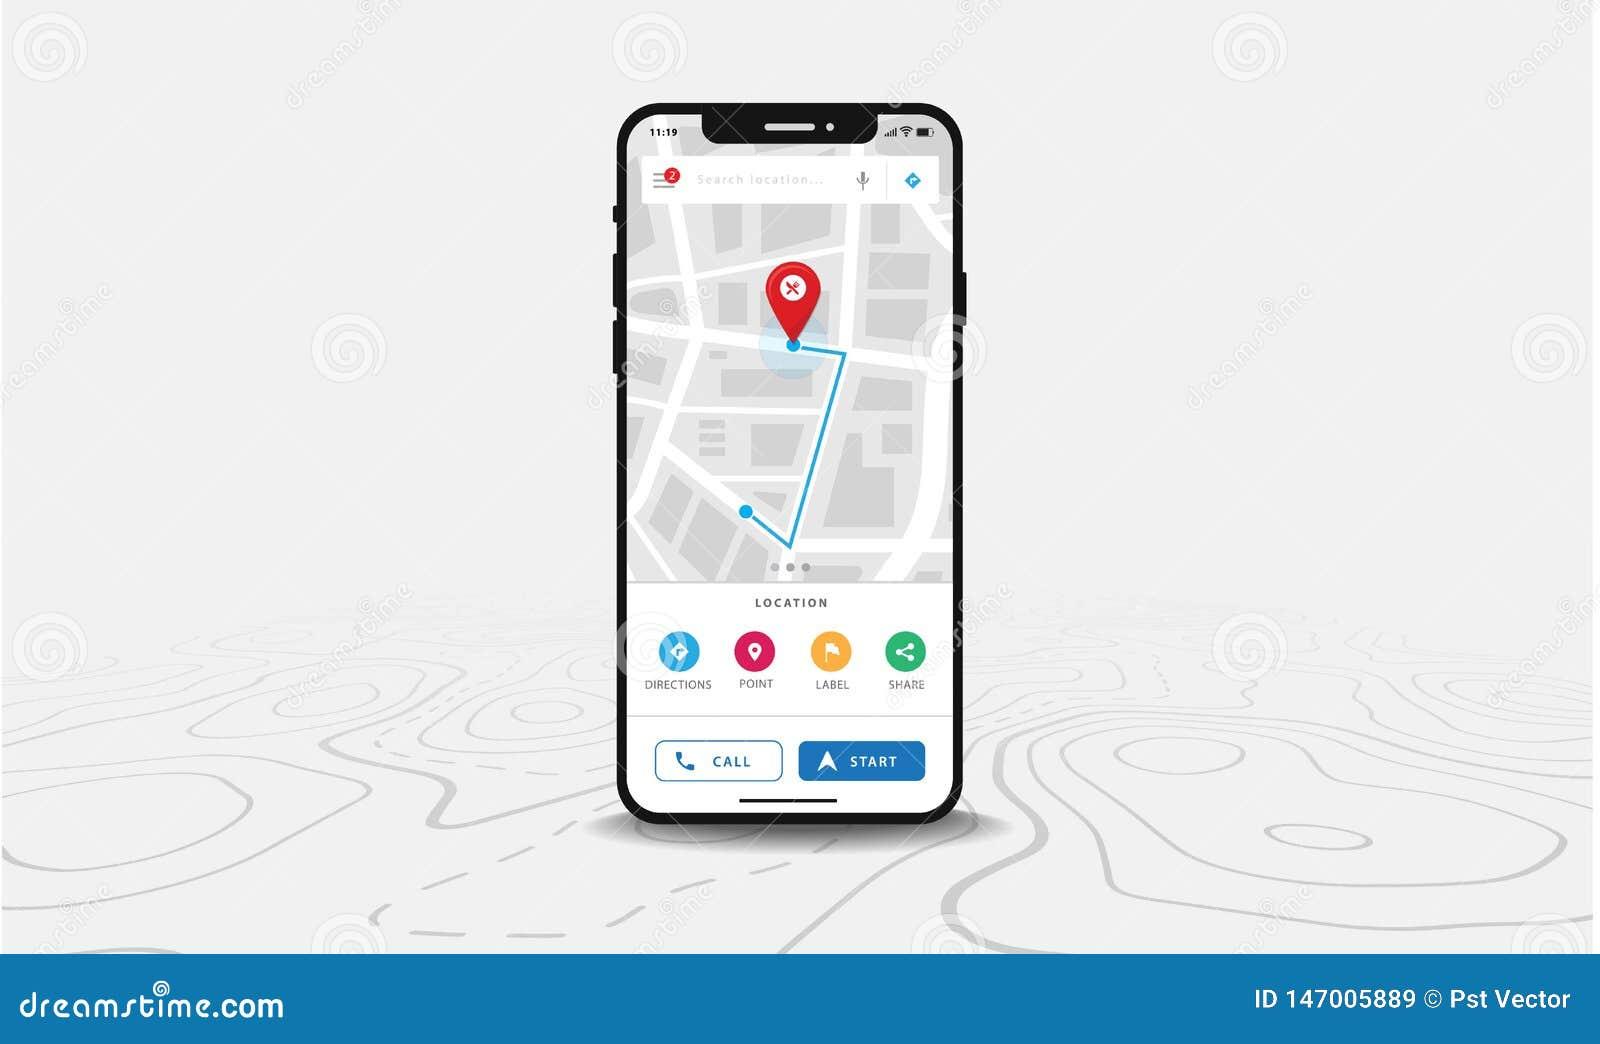 Map GPS Navigation, Smartphone Map Application And Red ... Map Navigation App on technology app, golf gps app, health app, star chart app, climate control app, insurance app, travel app, clothing app, language app, food app, menu app, business app, gps tracking app, construction app, communication app, education app,